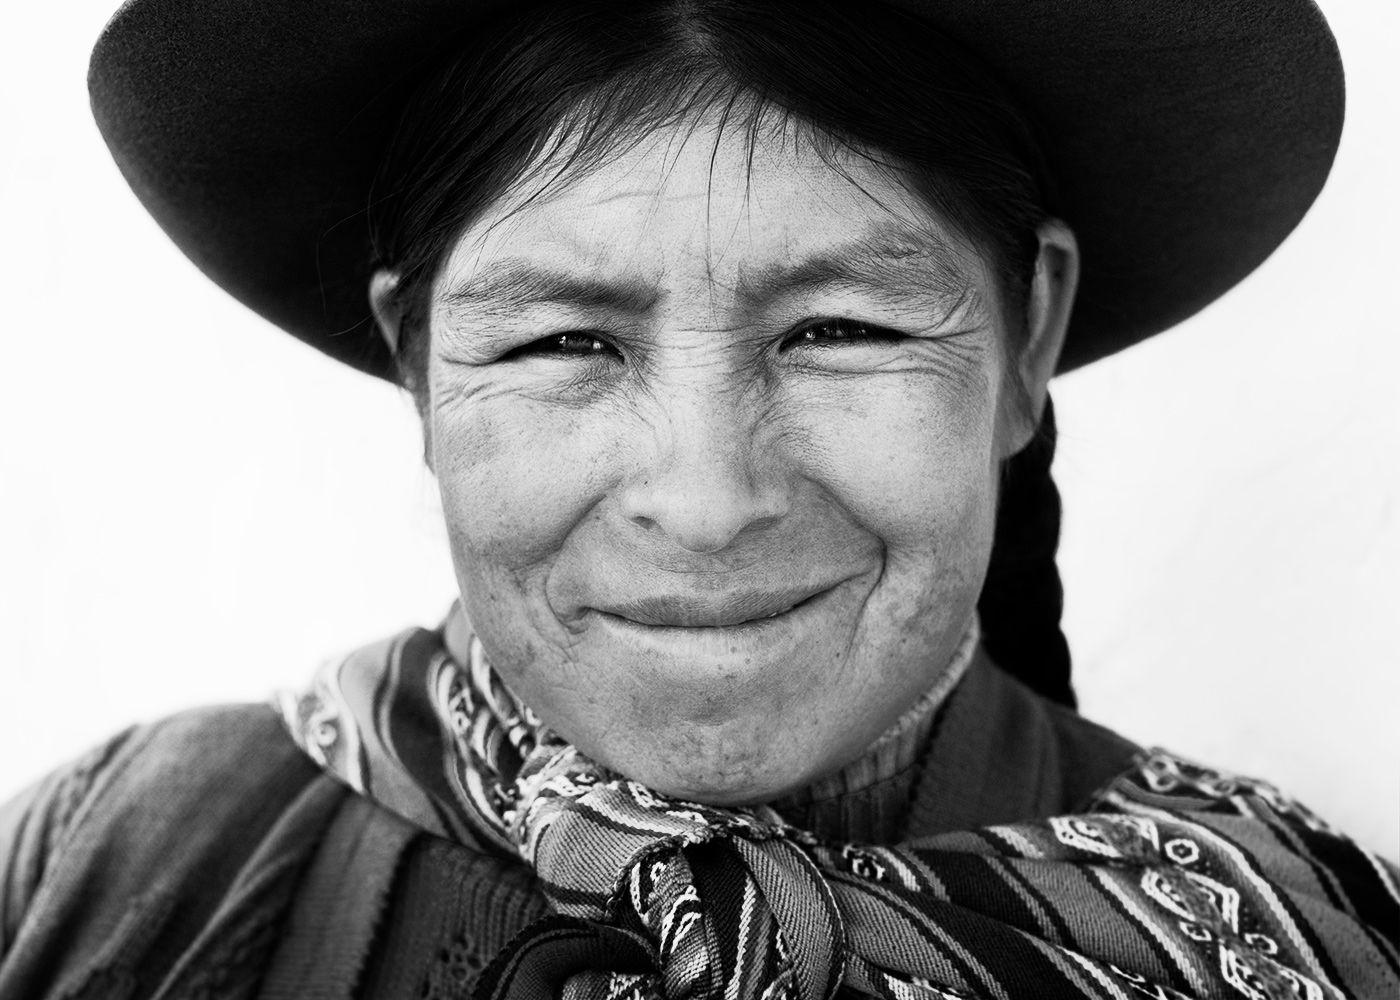 Peru_0076cc2.jpg